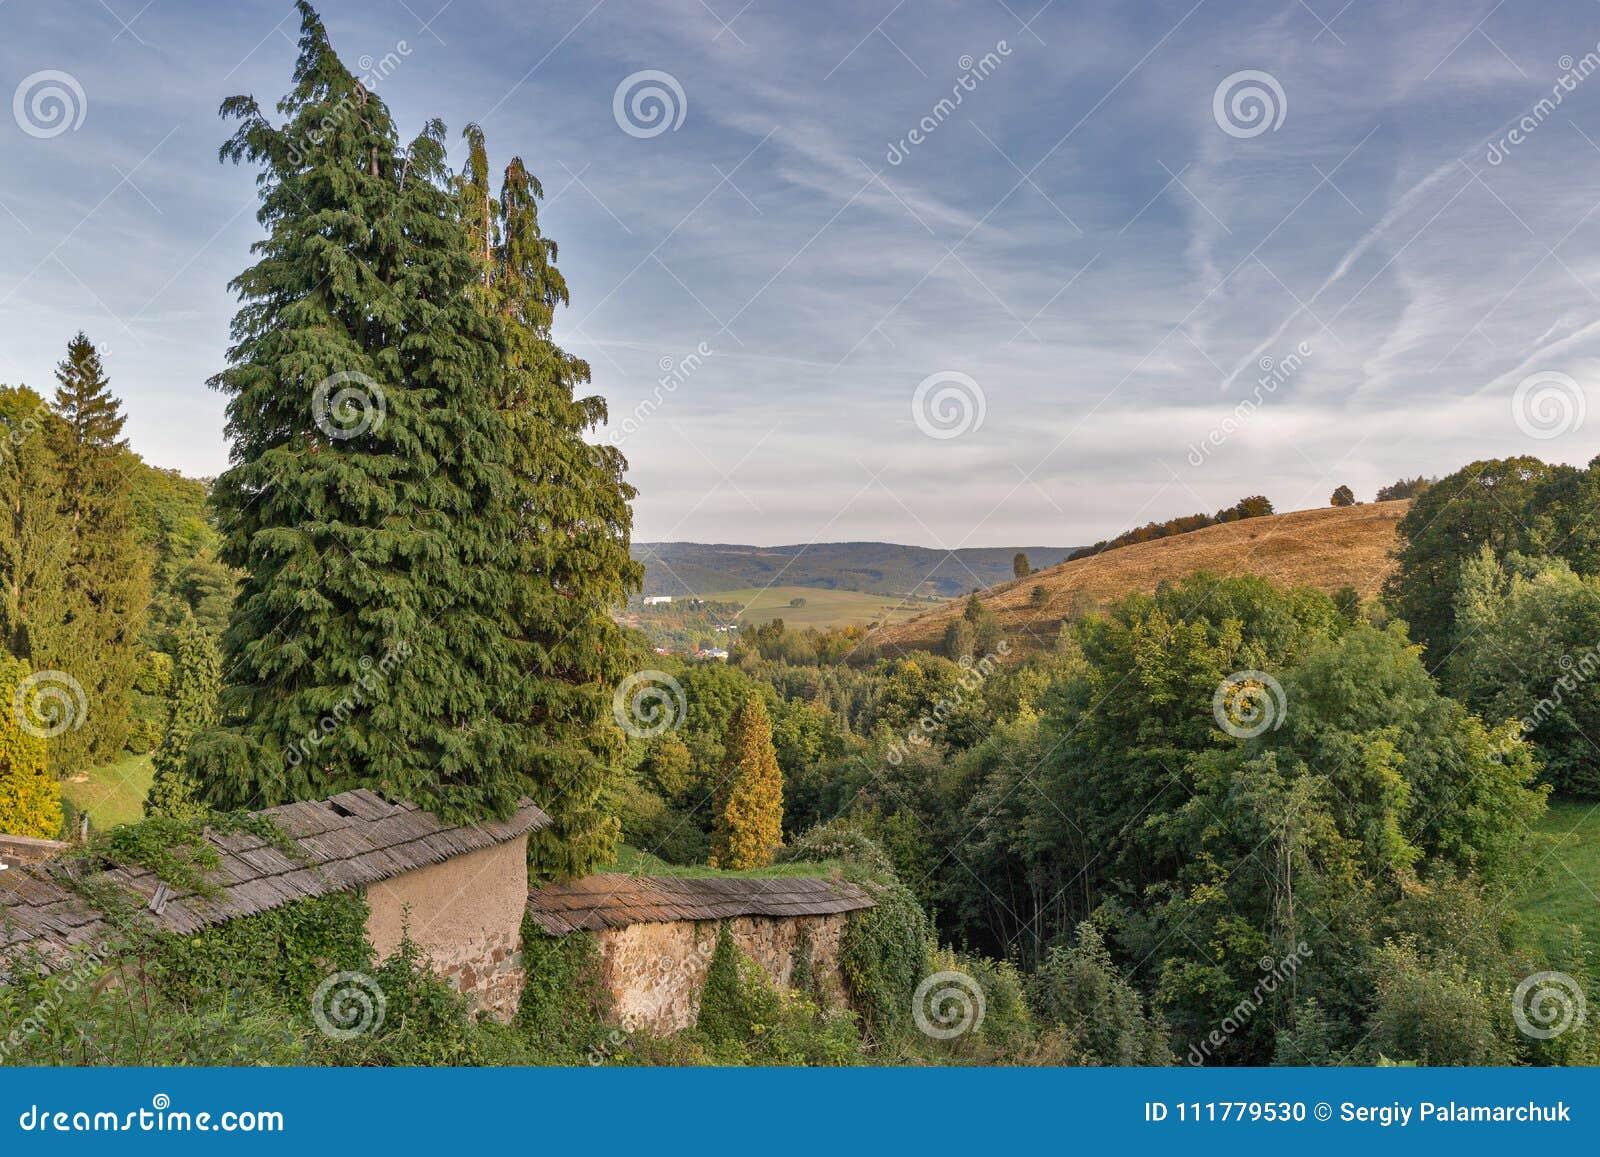 Autumn landscape close to Banska Stiavnica, Slovakia.